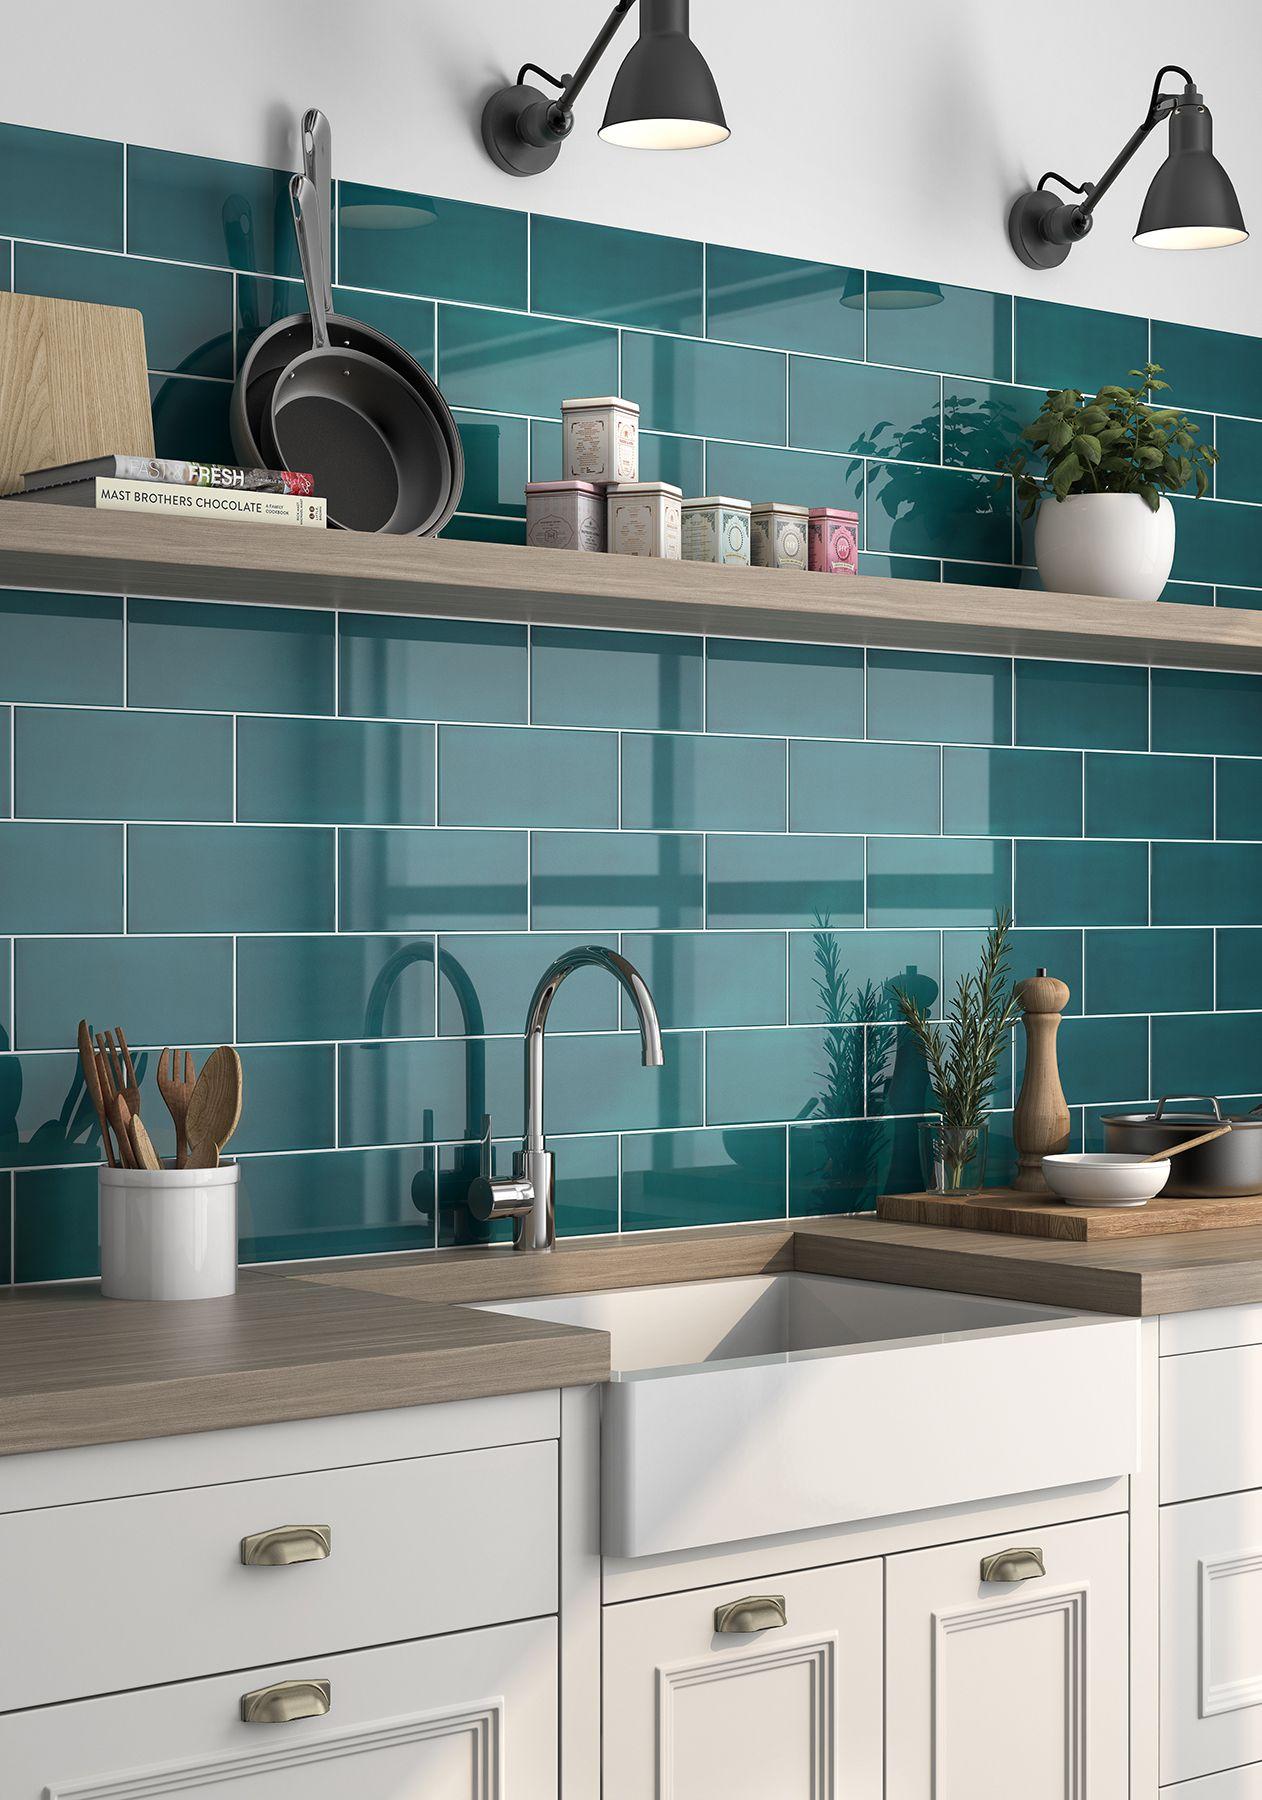 Joy Tiles Ceramic Wall Characteristics Application Blue Ceramic Color Gray Green Look Material Mul Kitchen Tiles Kitchen Interior Blue Kitchen Tiles